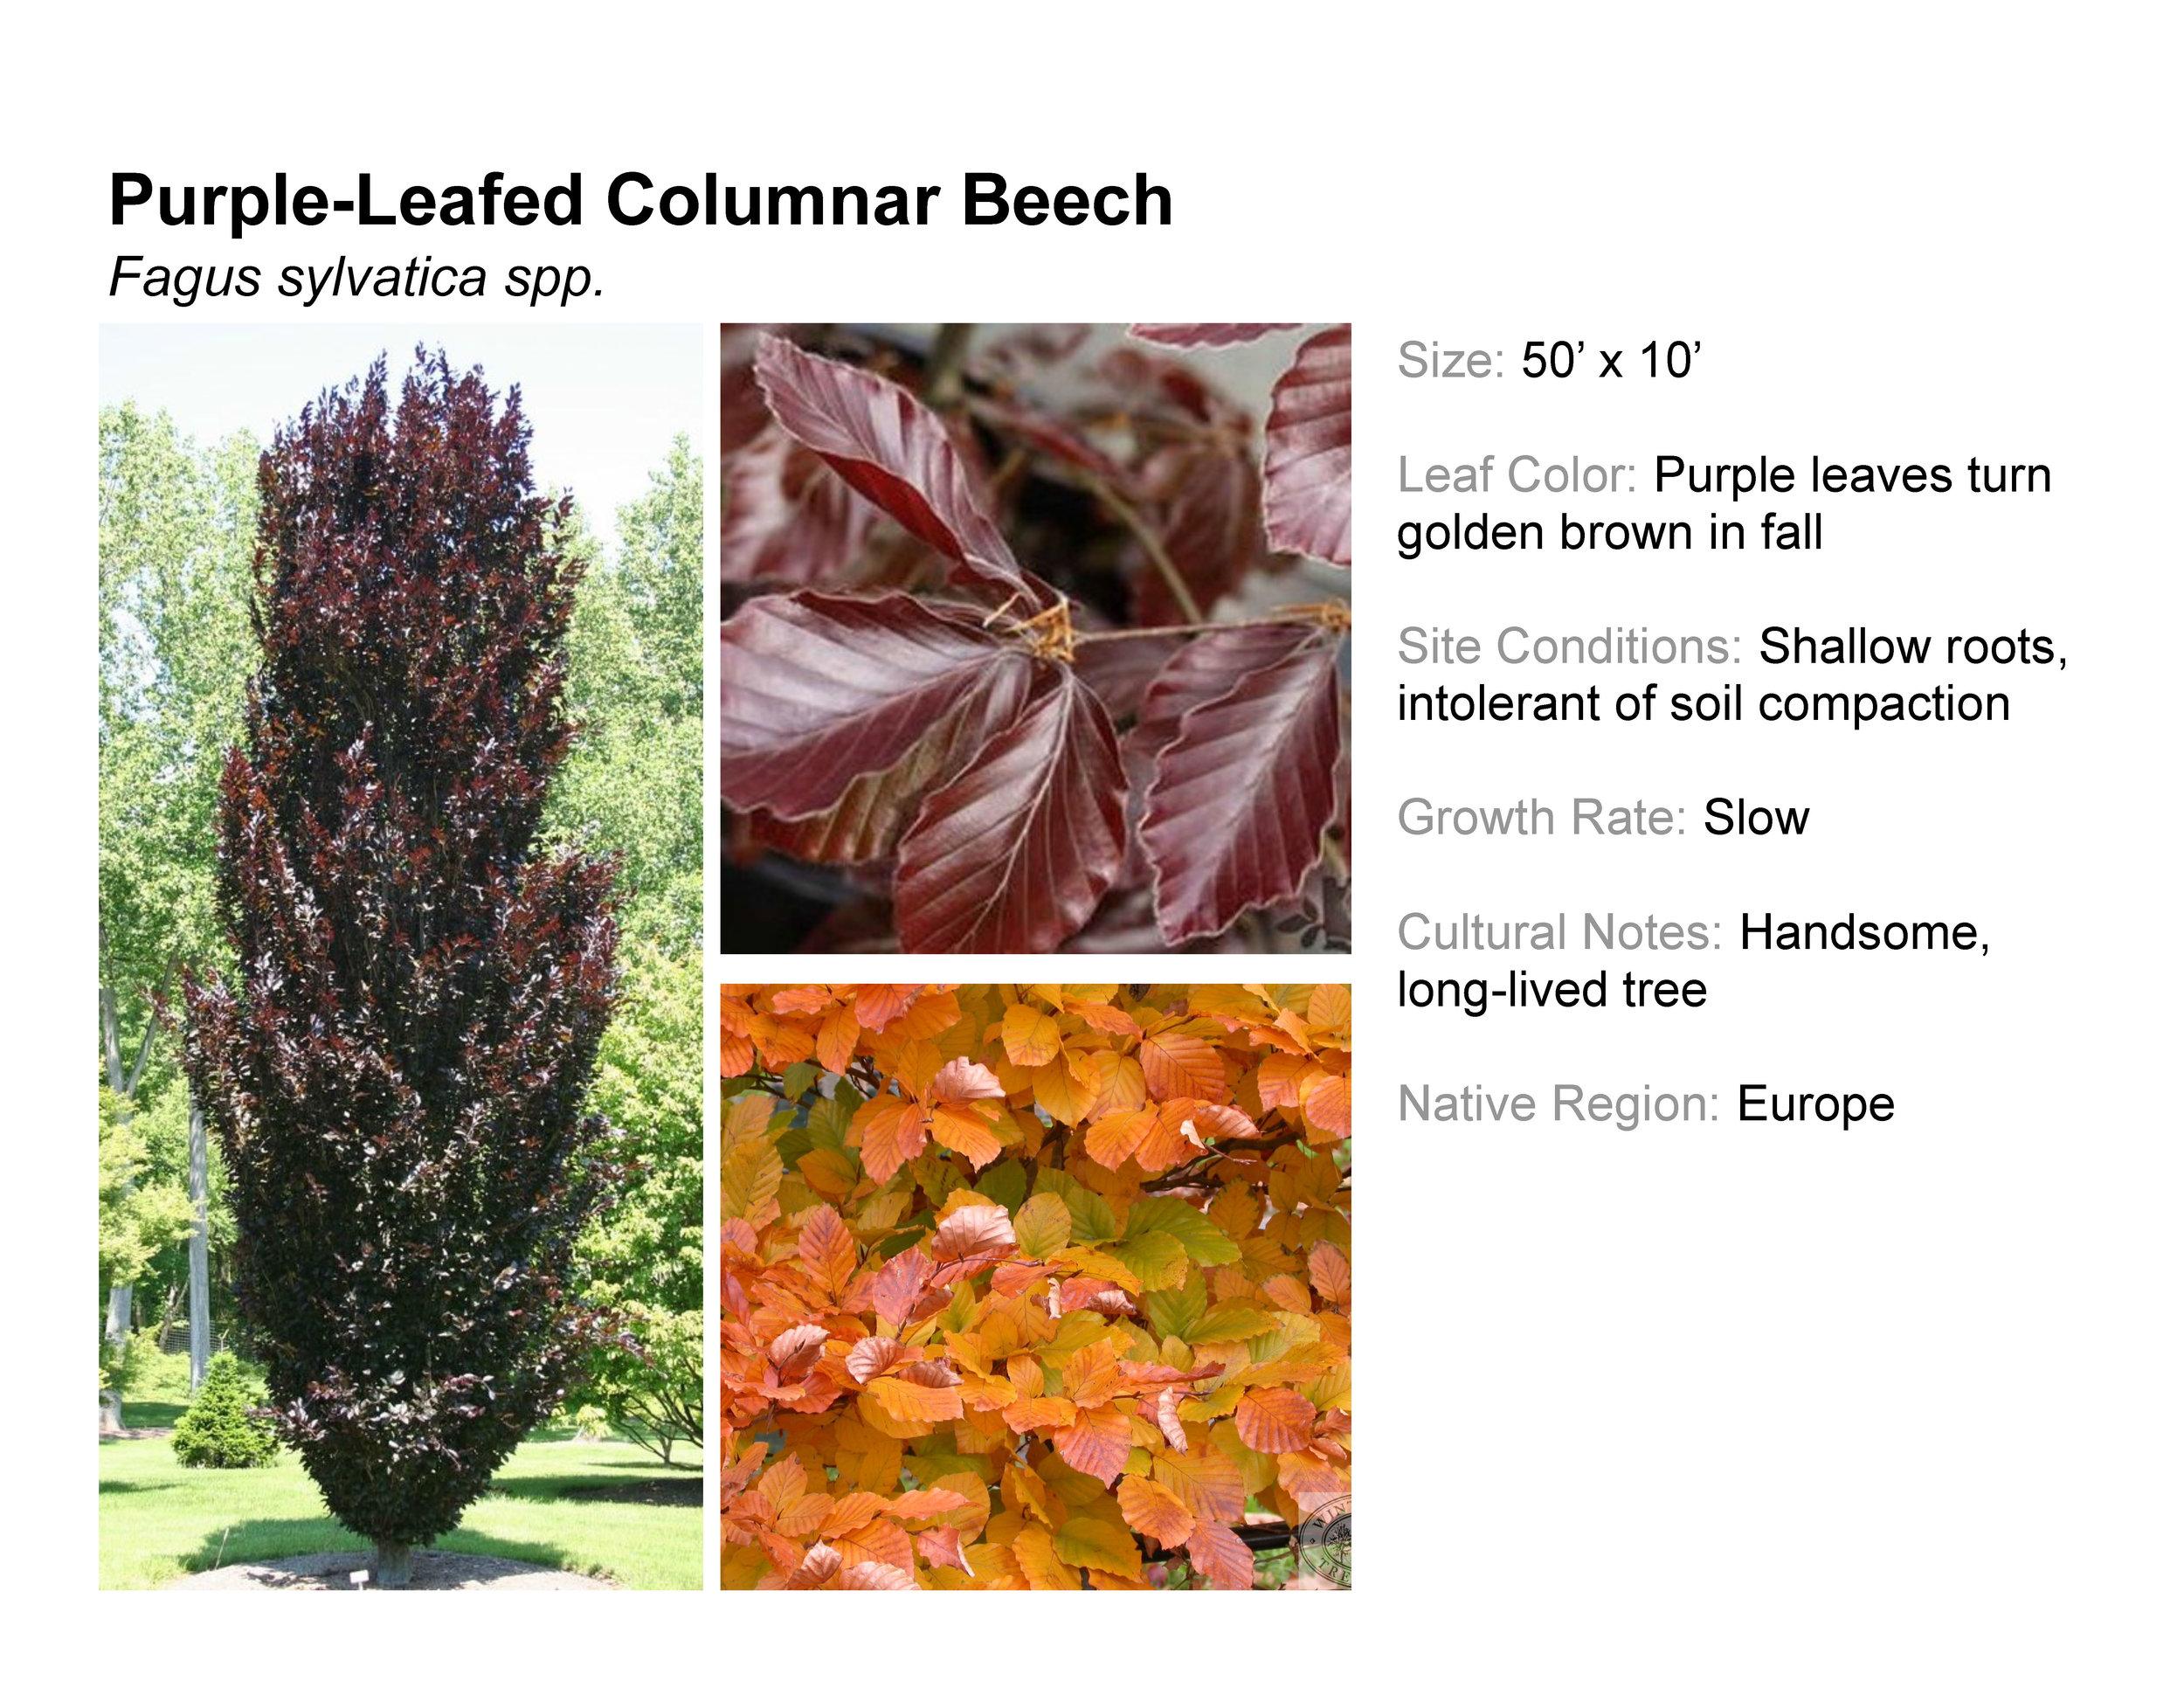 Purple-Leafed Columnar Beech